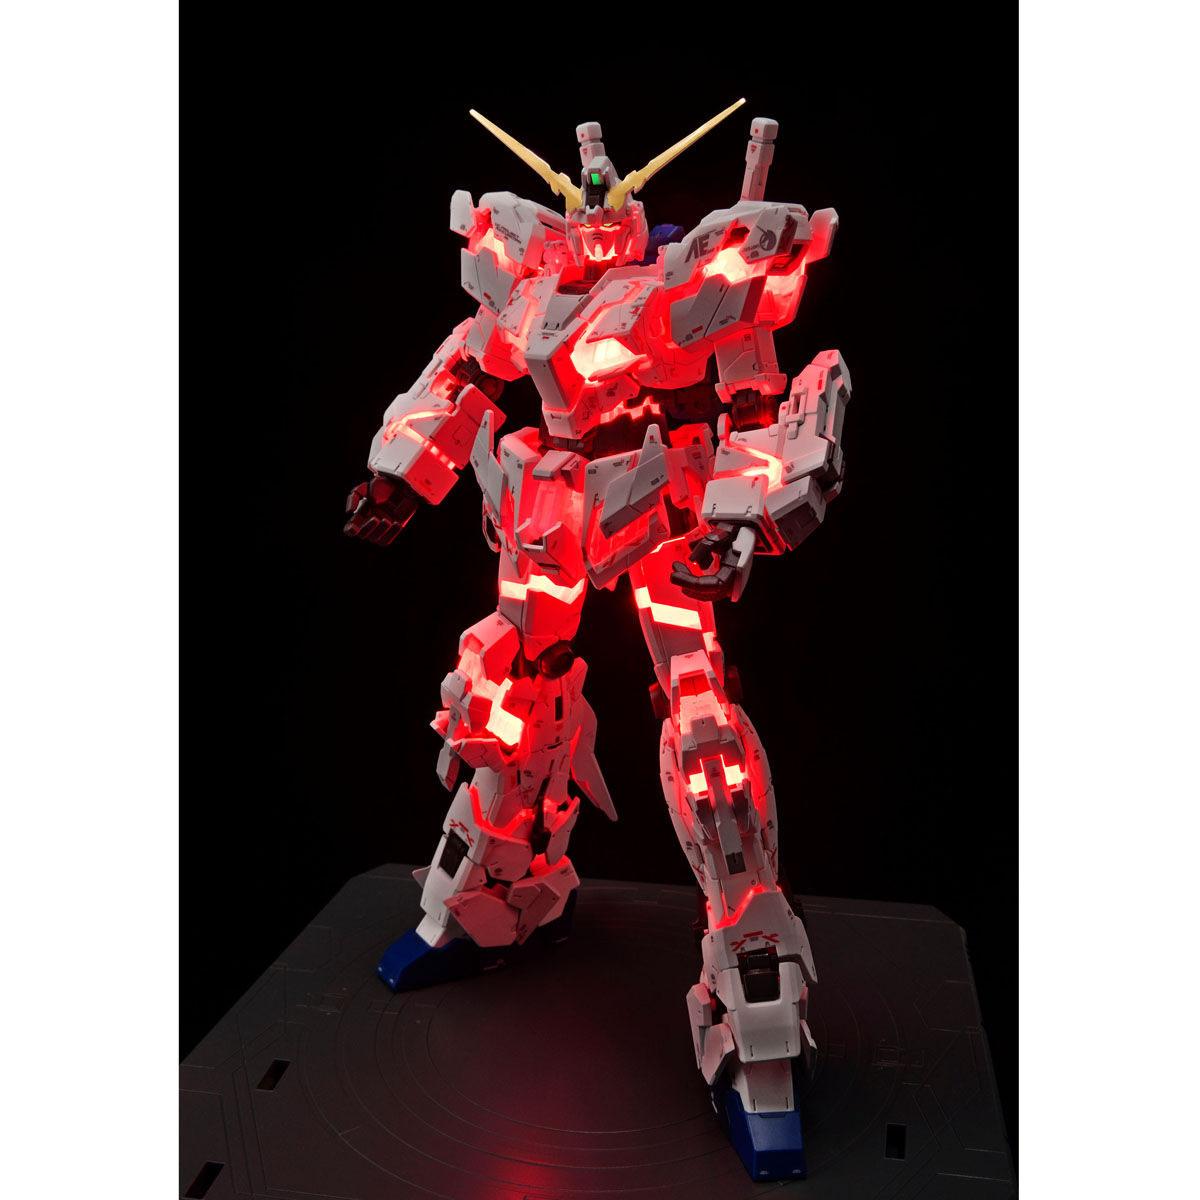 RG 1/144『ガンダムベース限定 RX-0 ユニコーンガンダム(デストロイモード)Ver.TWC(LIGHTING MODEL)』プラモデル-002